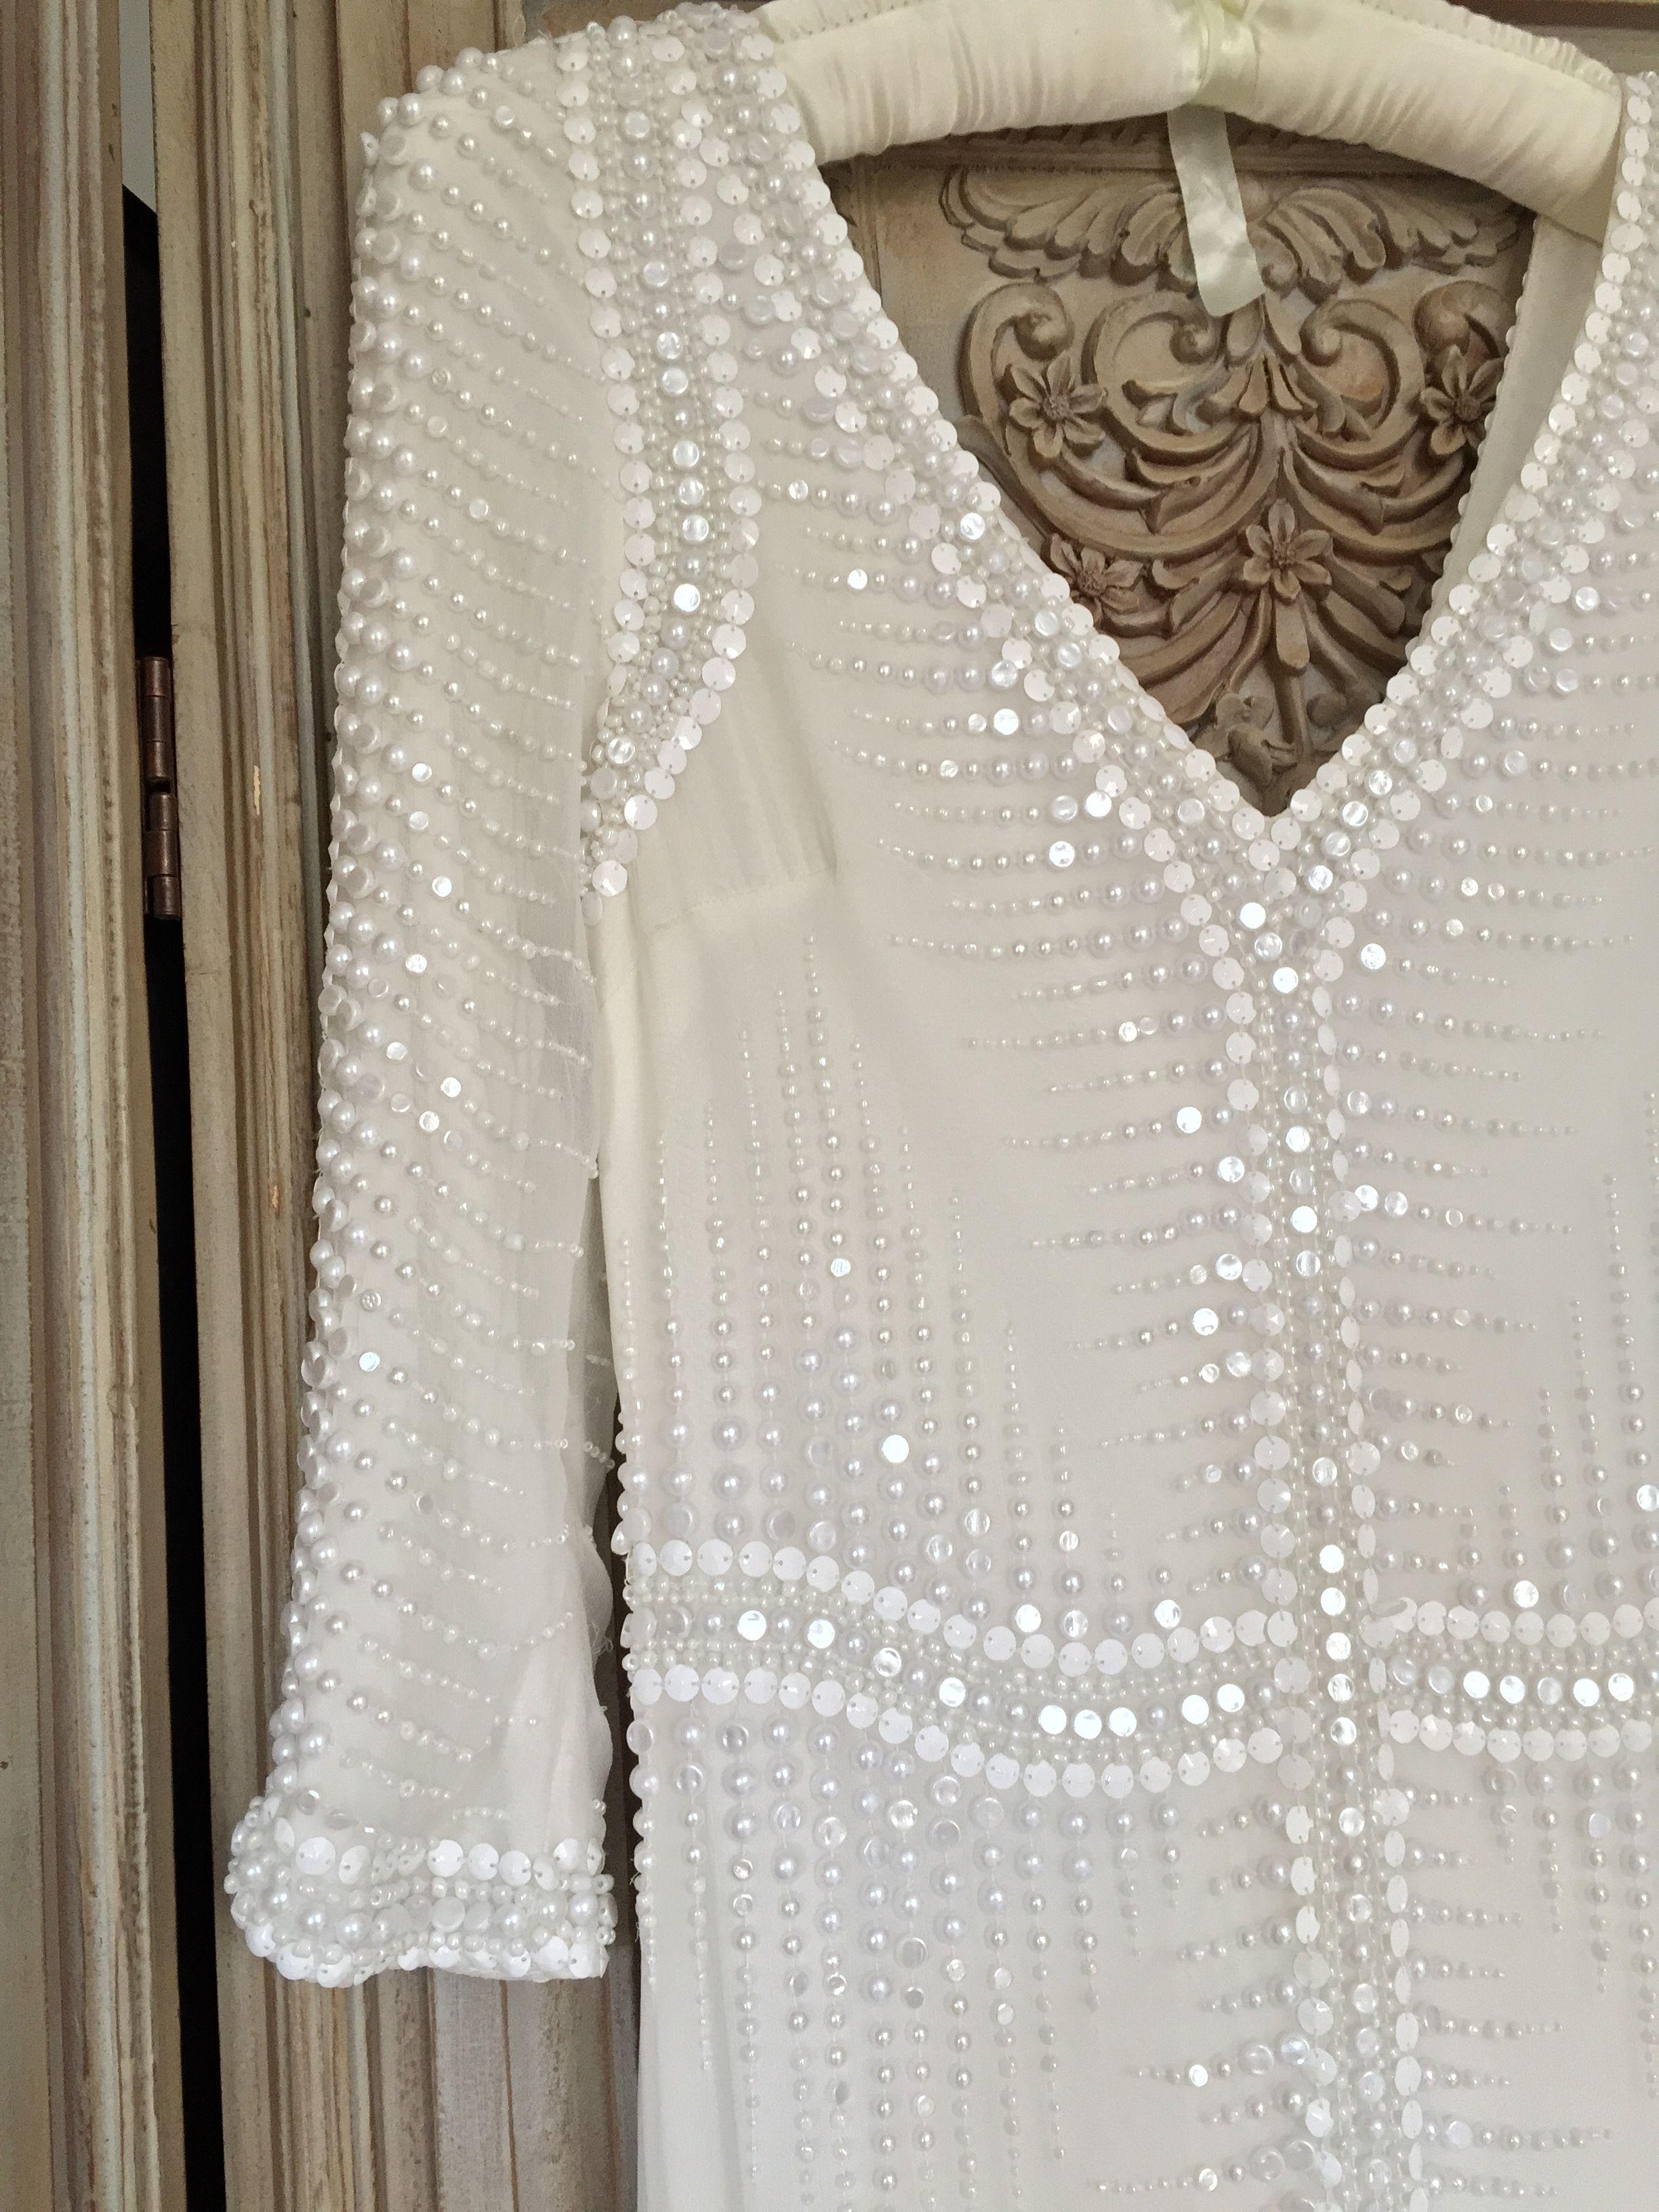 Eliza Jane Howell 'Pearl' £995 #elizajanehowell #pearl #sample #sampleweddingdress #weddingplanning #bride #bridetobe